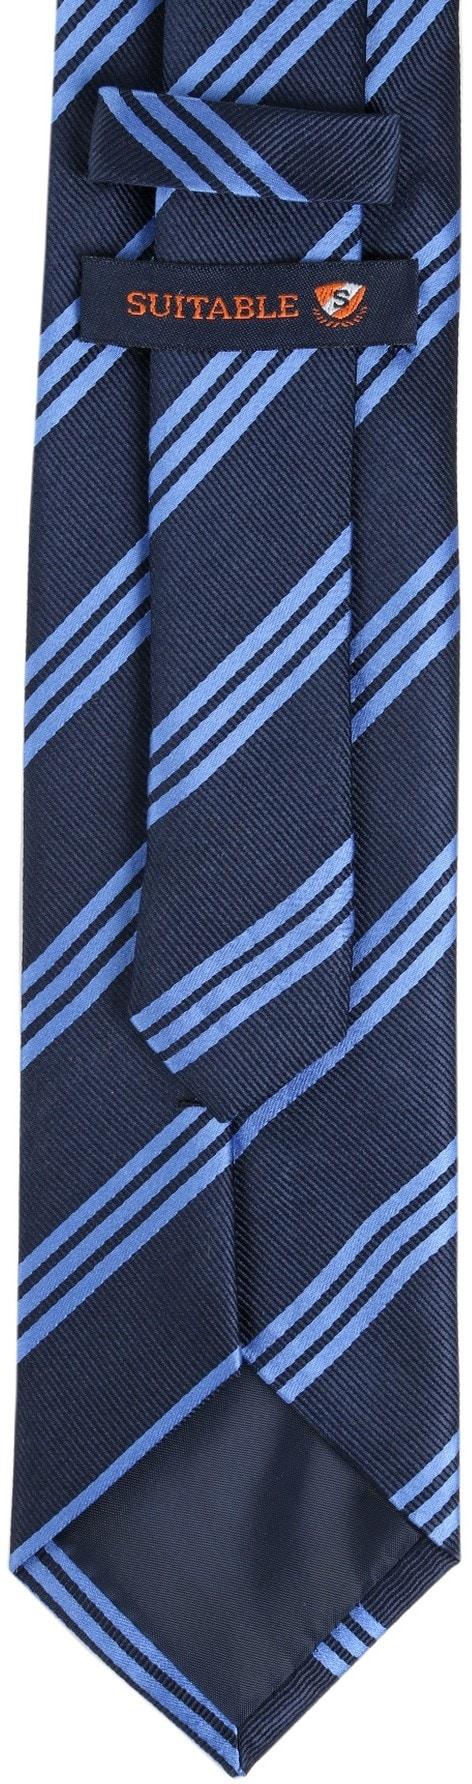 Krawatte Seide Streifen Navy Blau foto 3